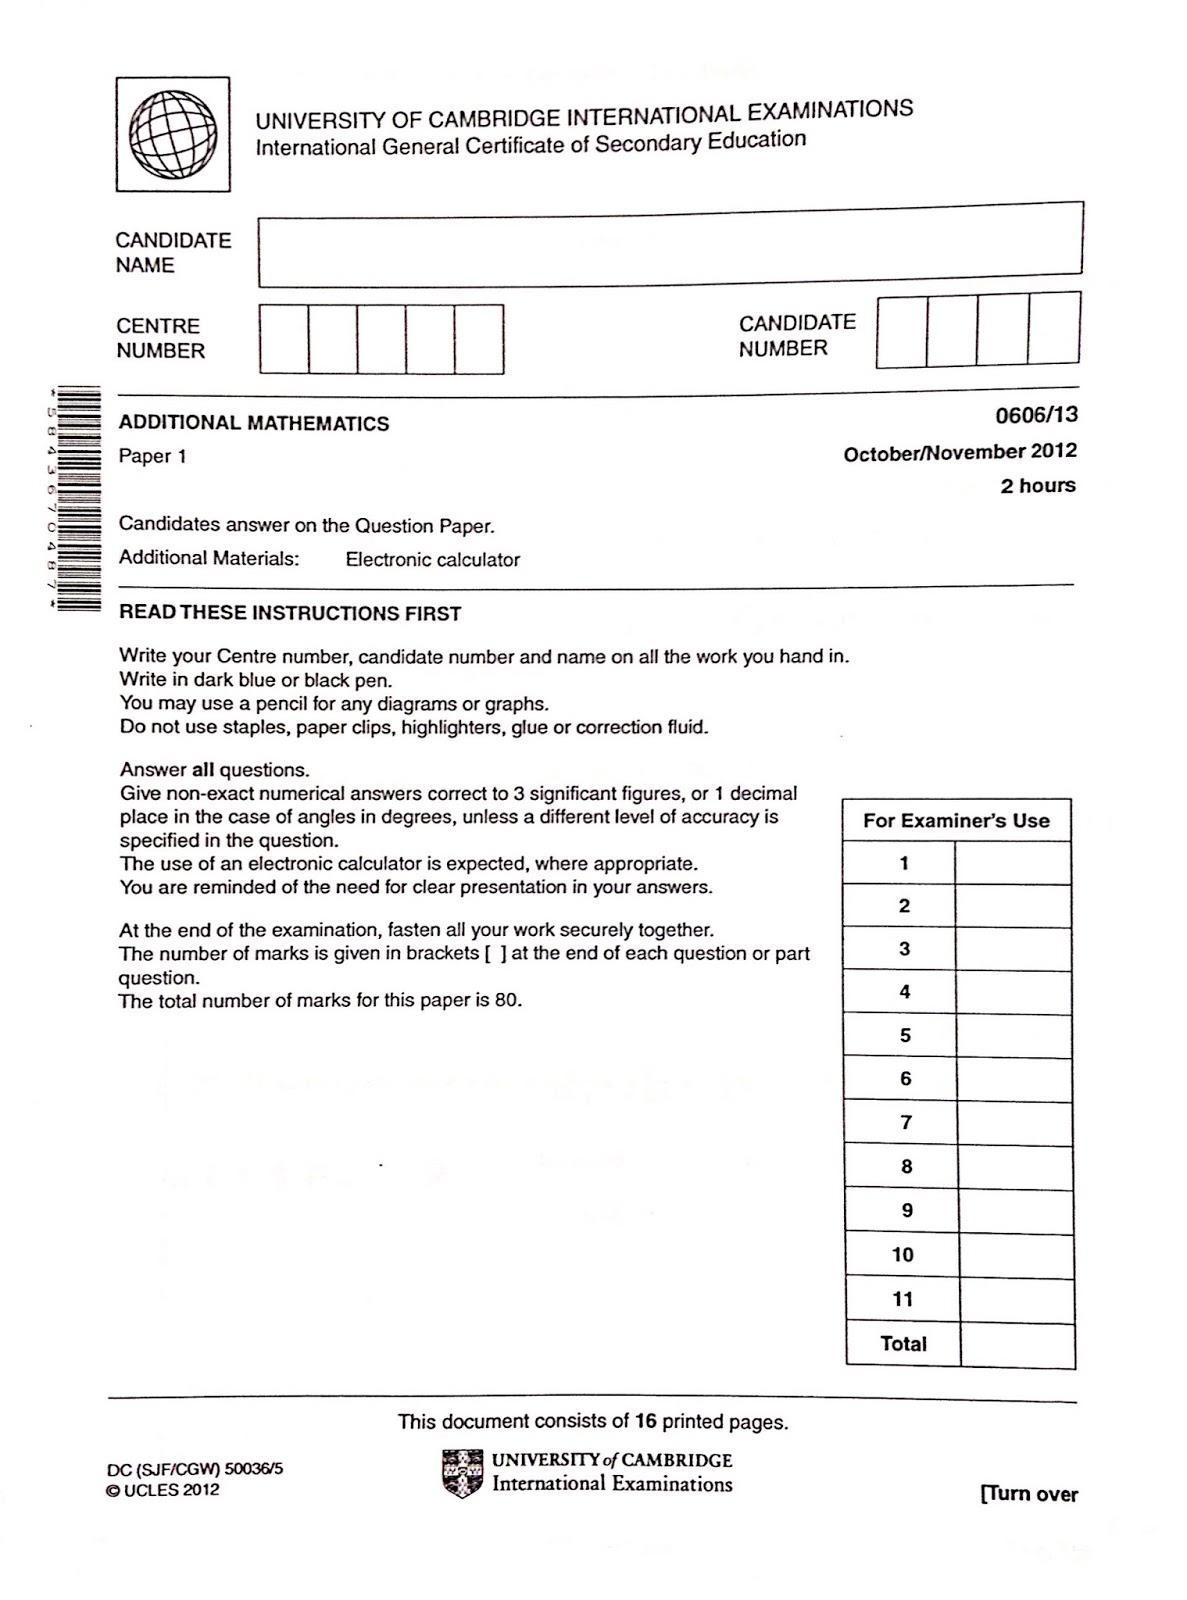 Igcse Add Maths Working Answers 13 Paper 1 Oct Nov